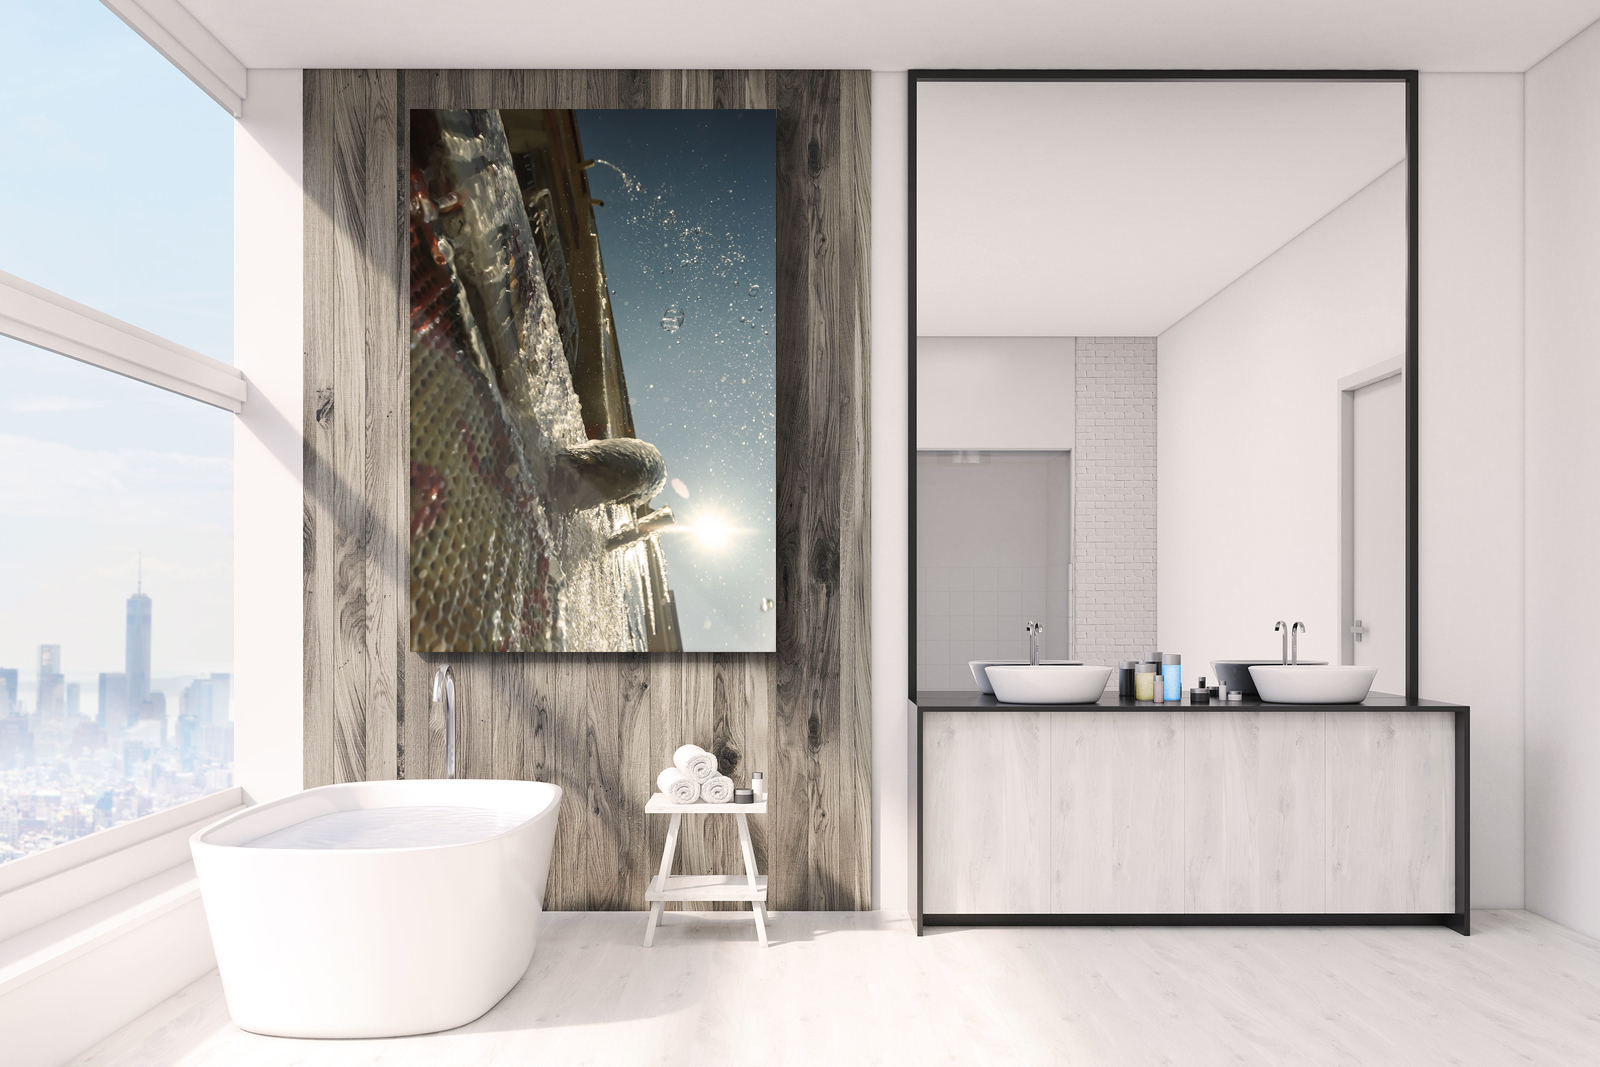 danny-k-lloyd-5ptz-melt-new-york-city-framed-fine-art-photography-1600.jpg